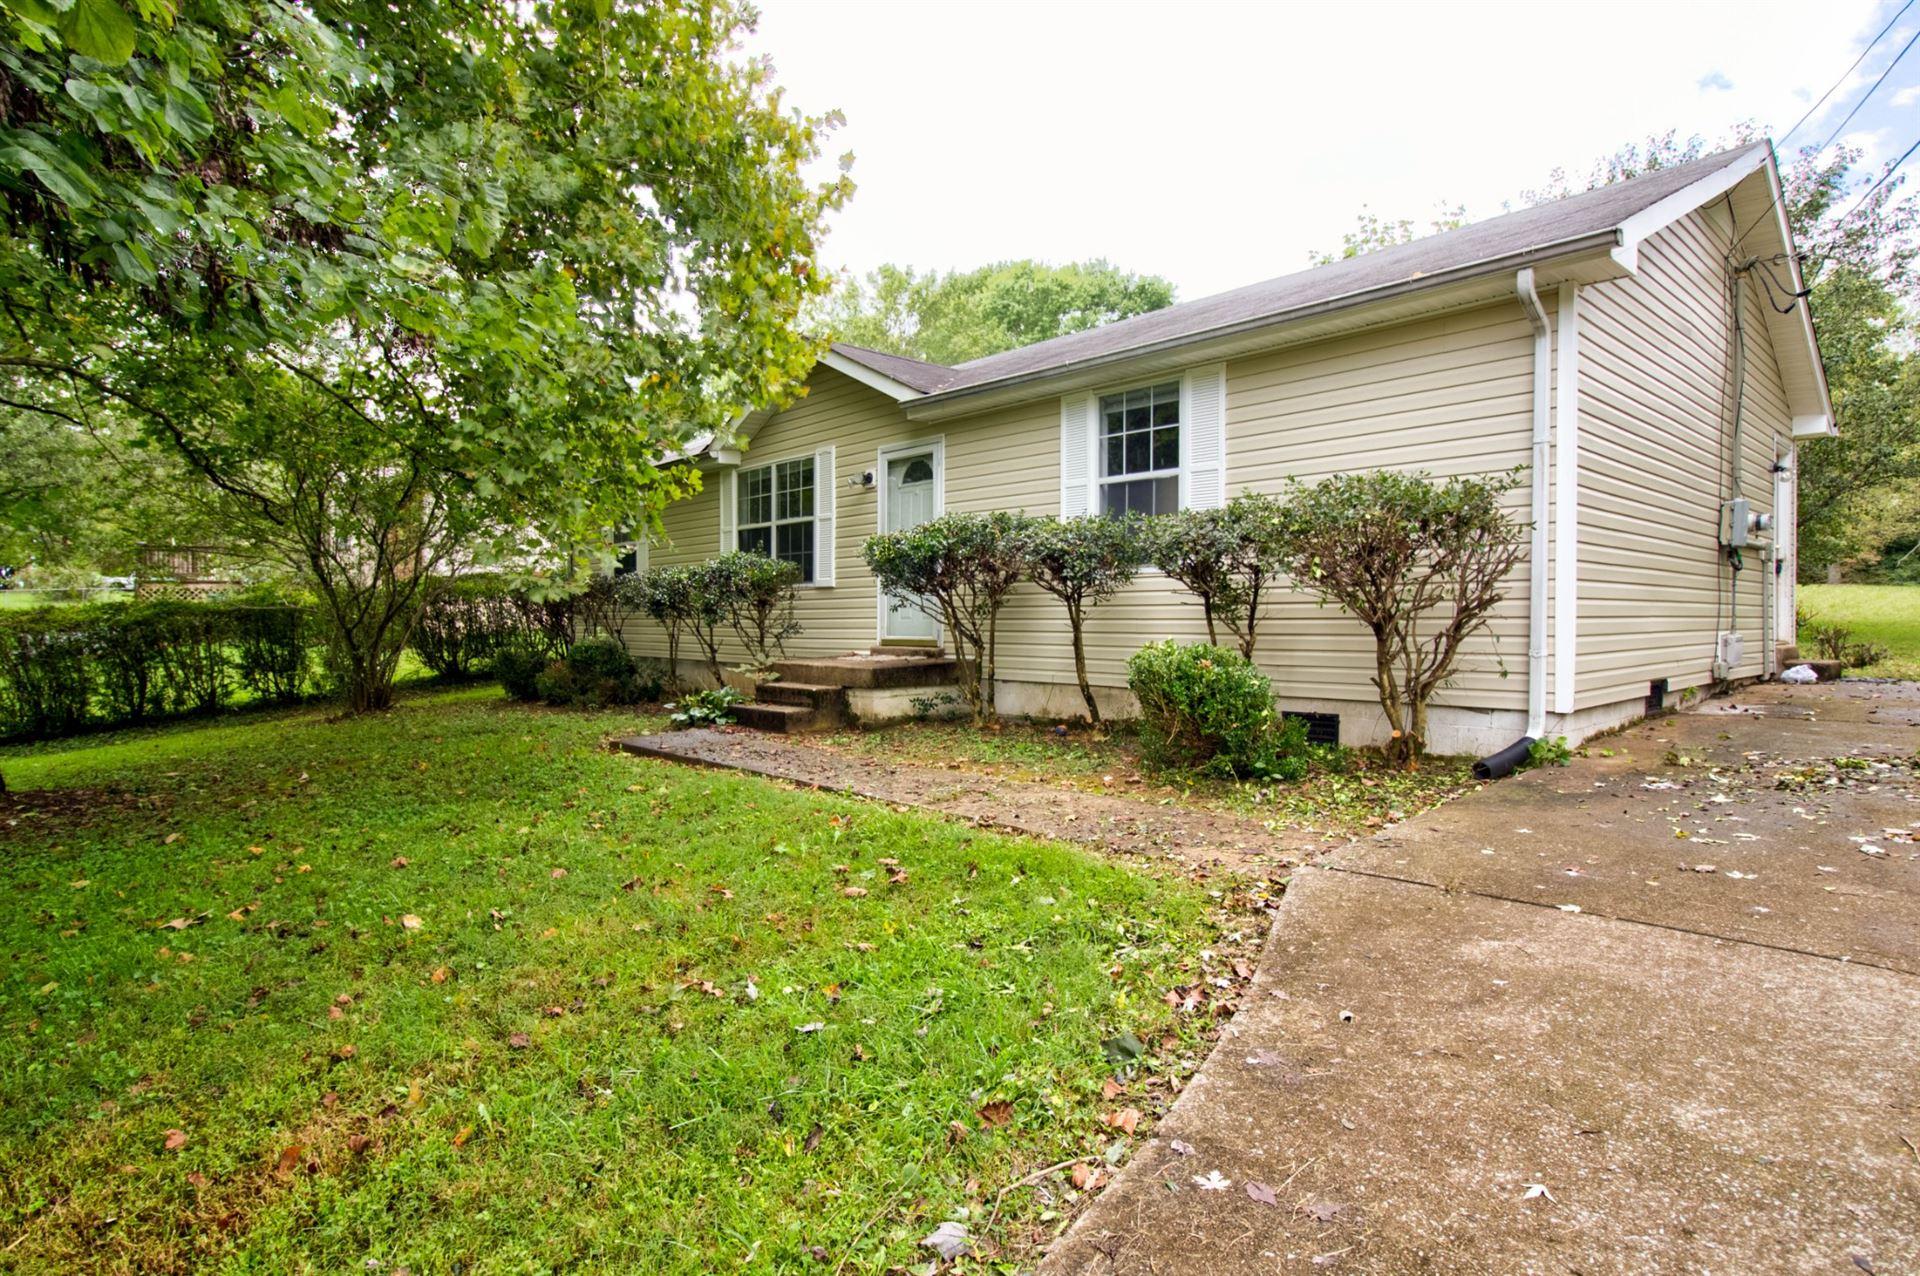 2124 Powell Rd, Clarksville, TN 37043 - MLS#: 2293582